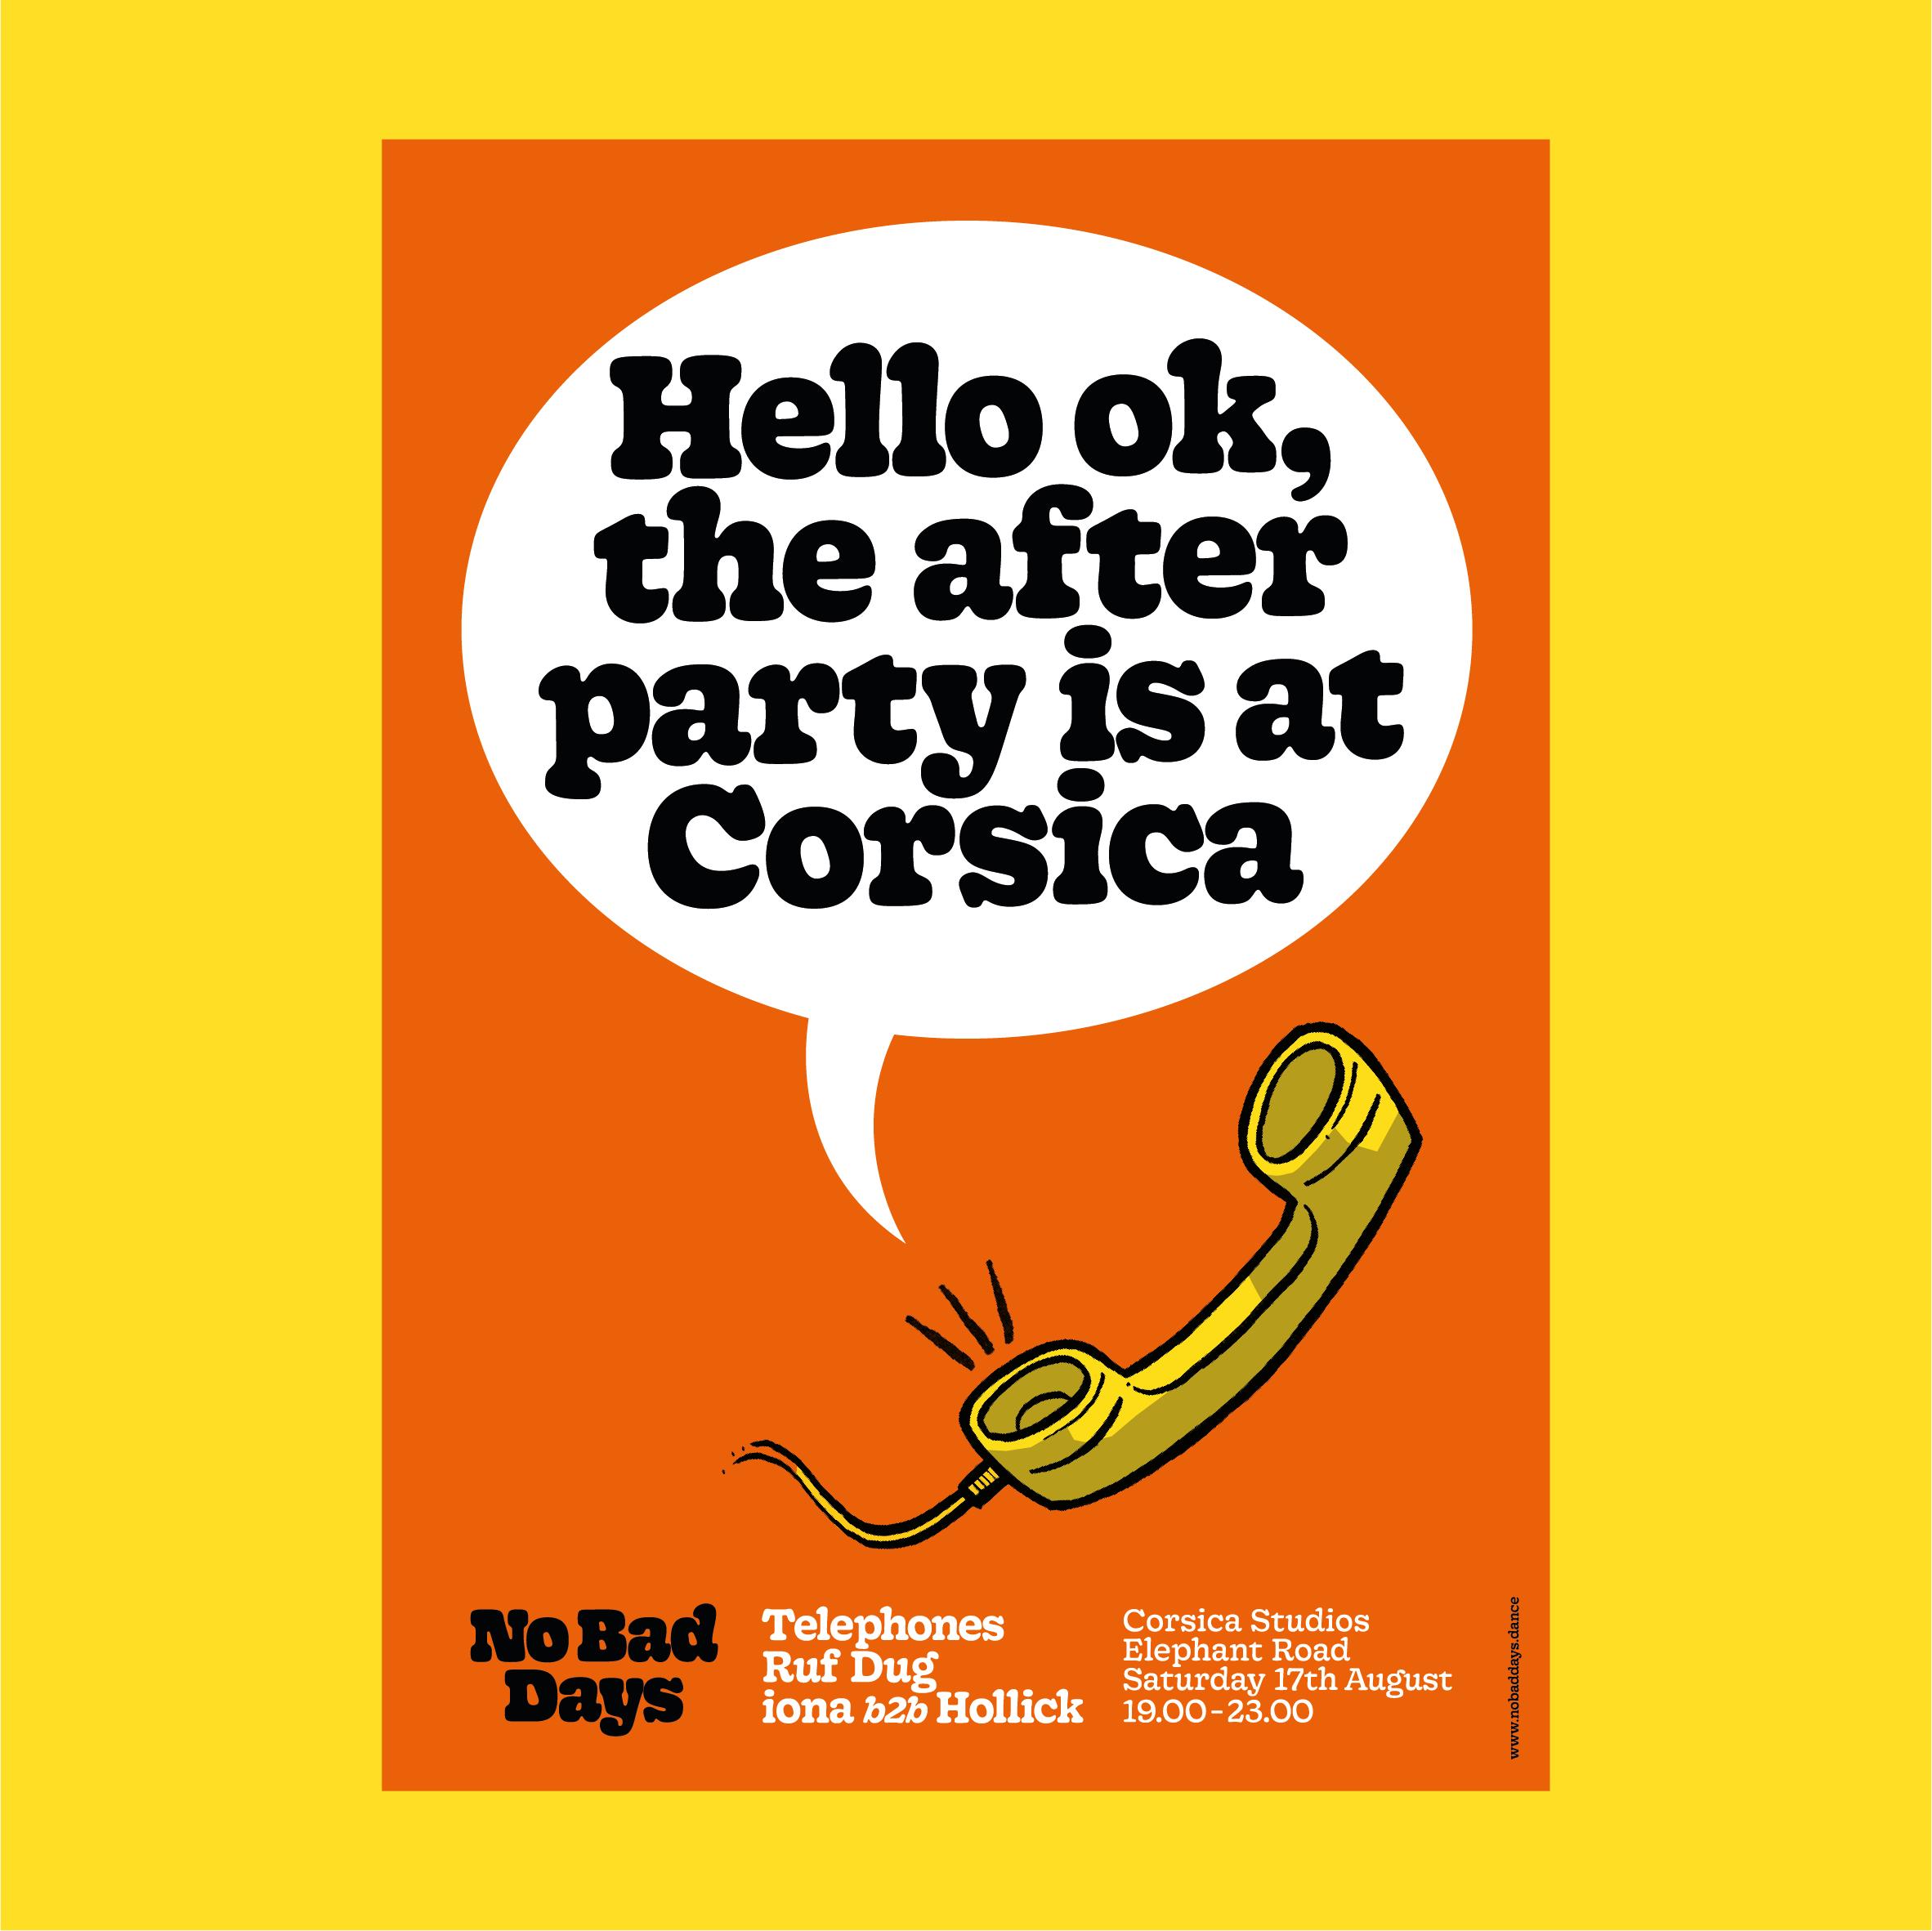 Corsica Studios A2 Poster